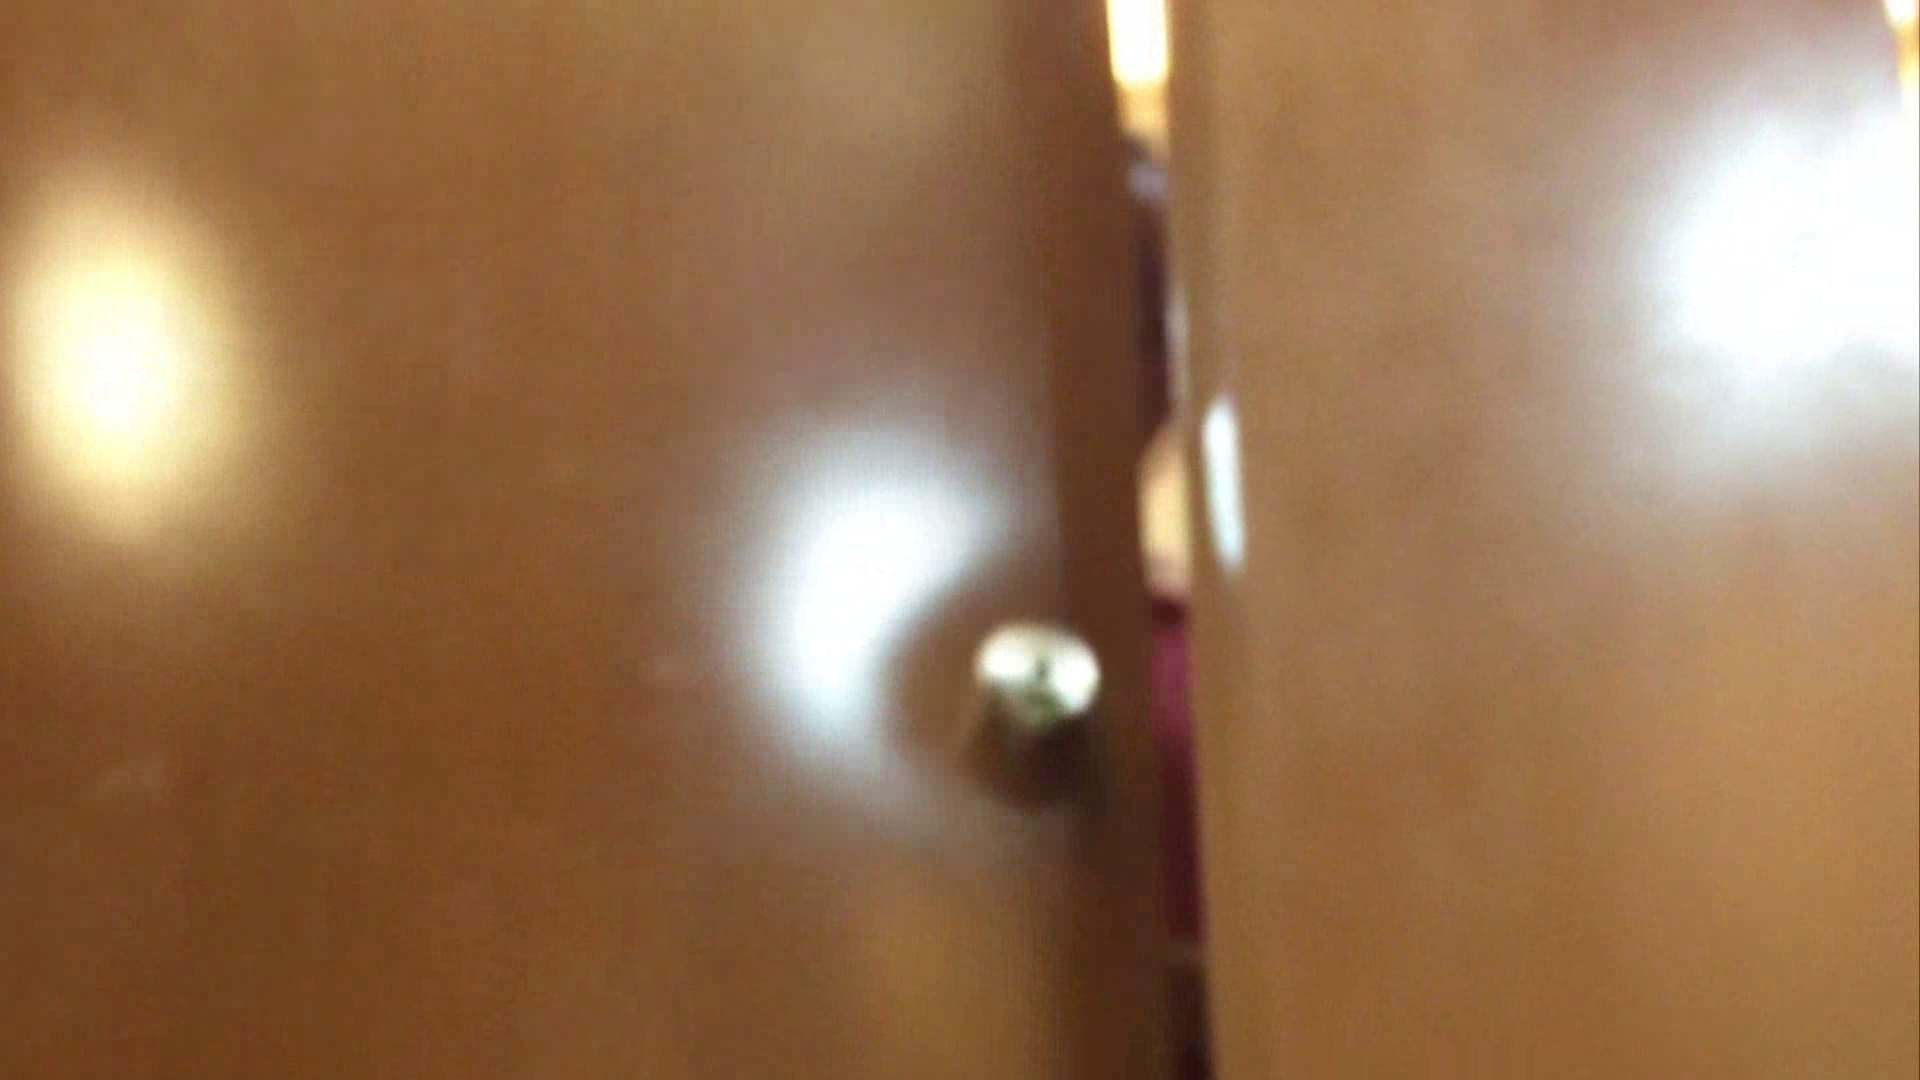 隣国化粧室下から御免!! No.15 洗面所 | 美女H映像  103画像 17